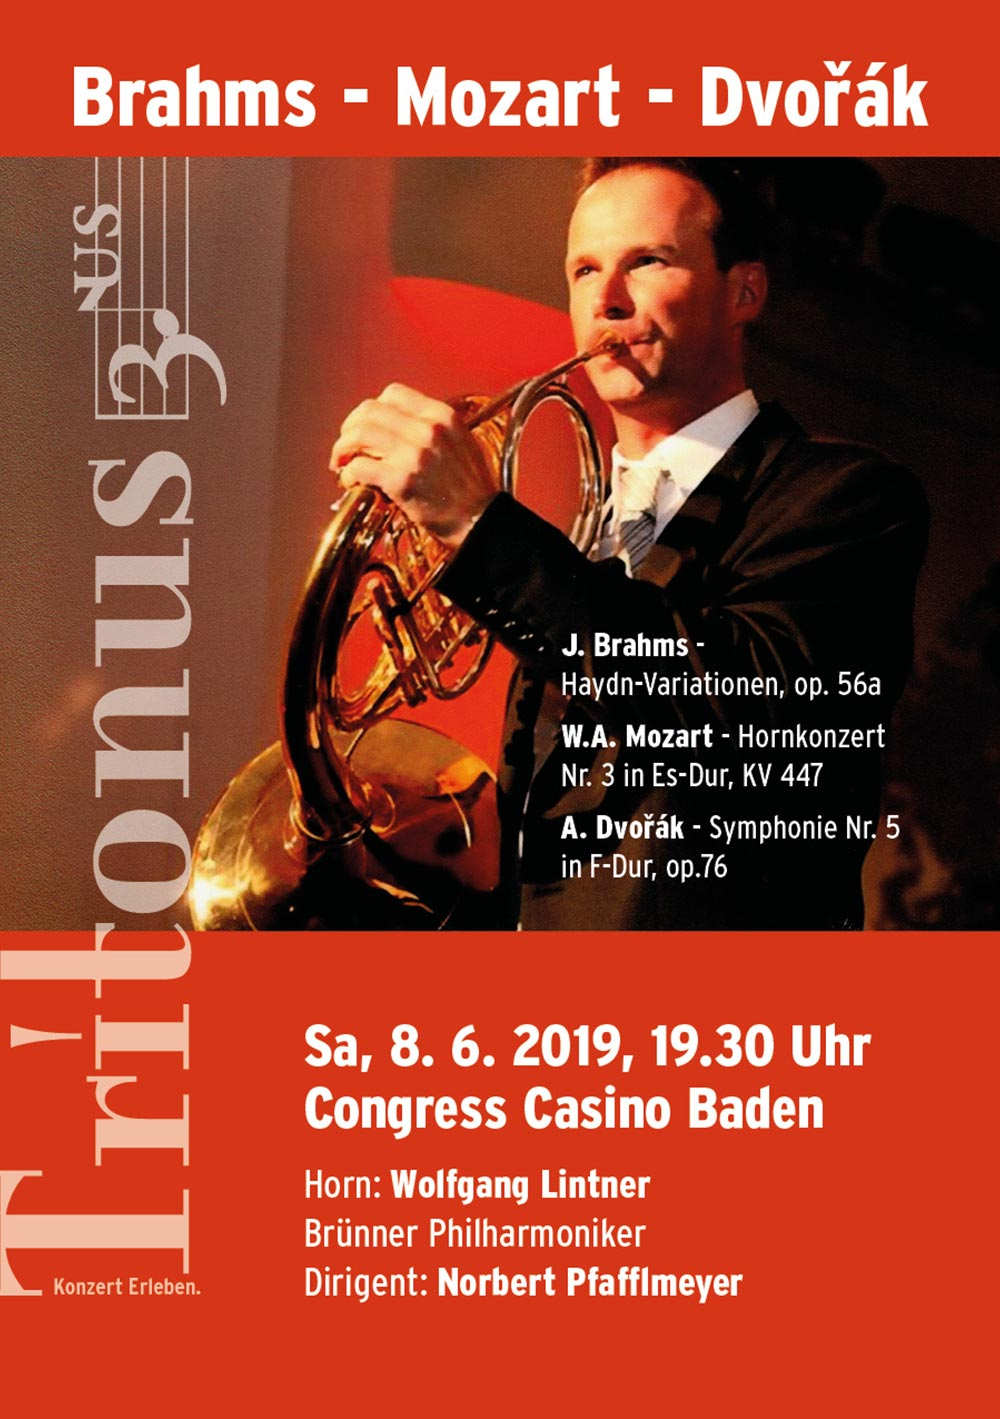 Konzert-Tritonus-Baden Brahms – Mozart - Dvořák